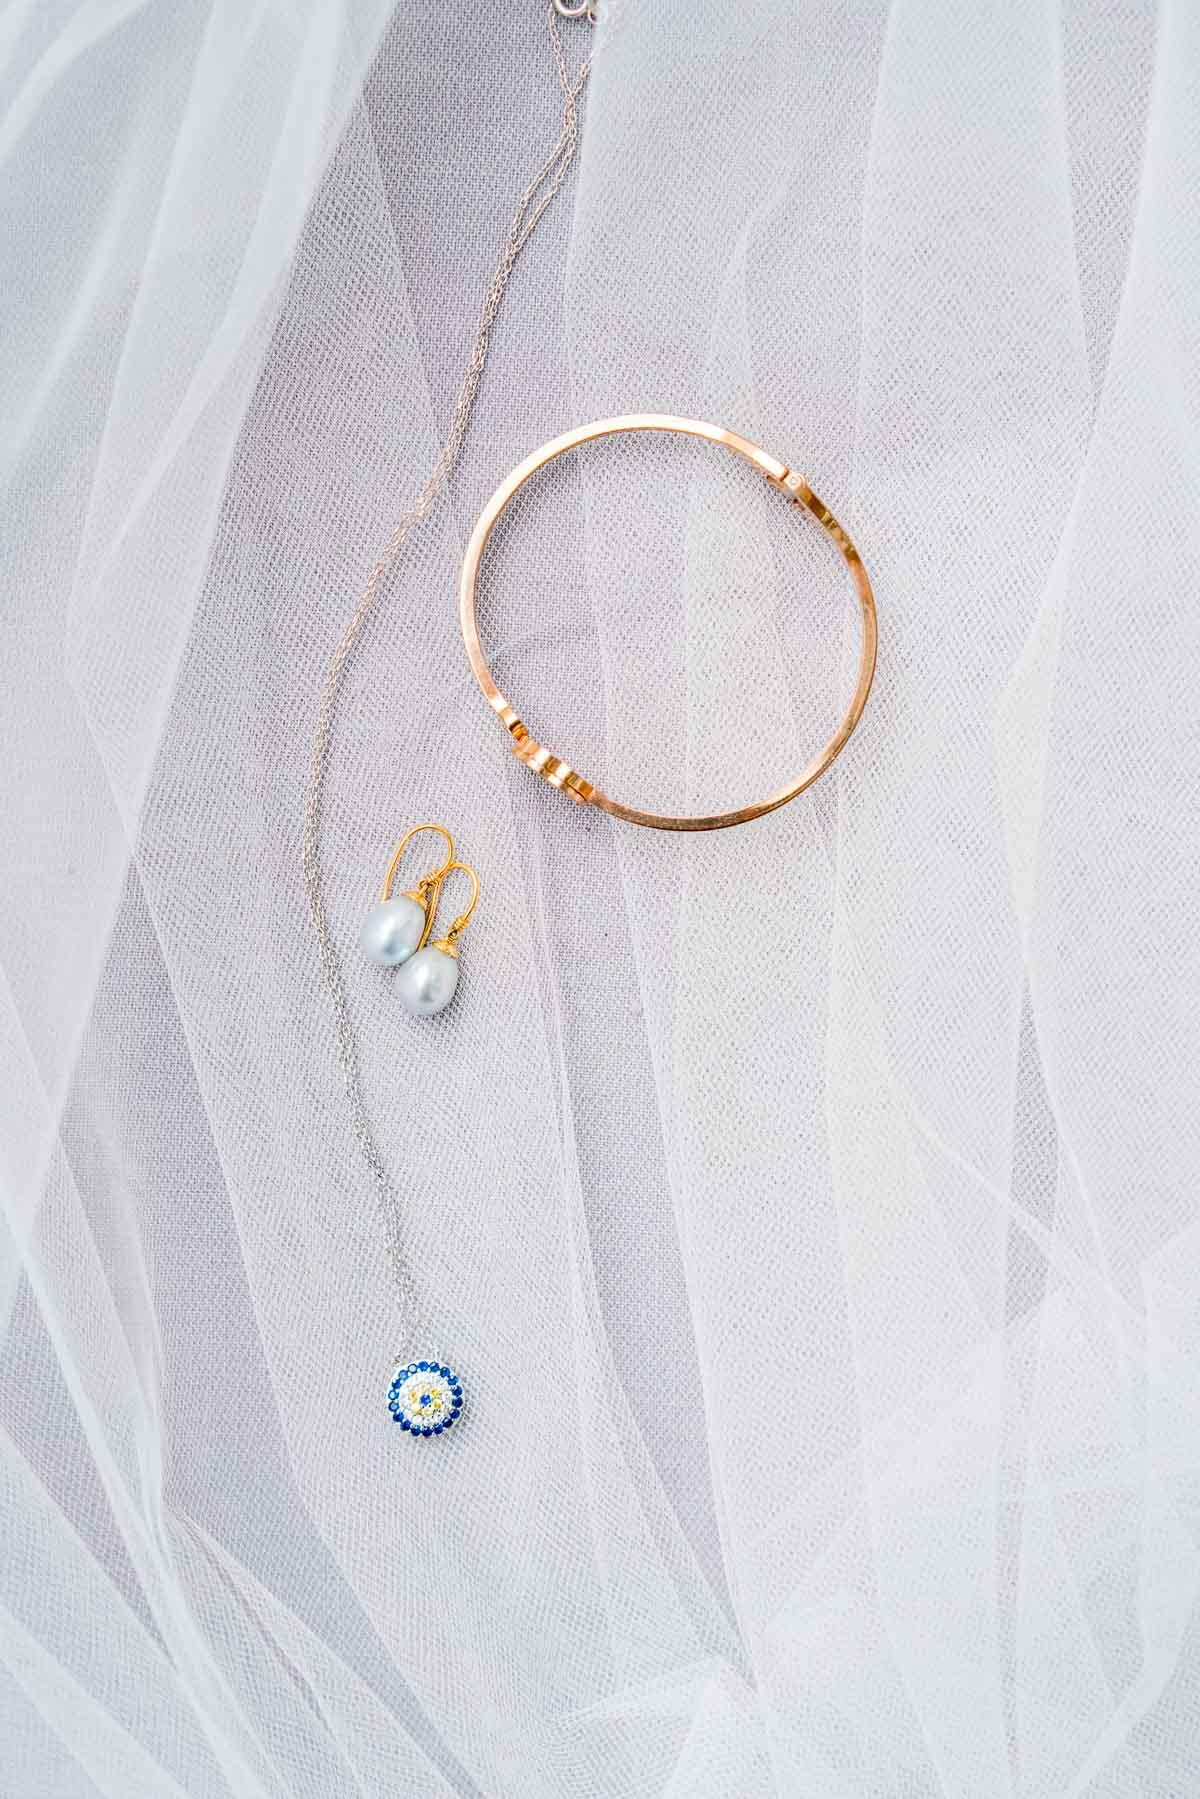 lindenderry-wedding-heart+soul-weddings-amy-alain-02925.jpg